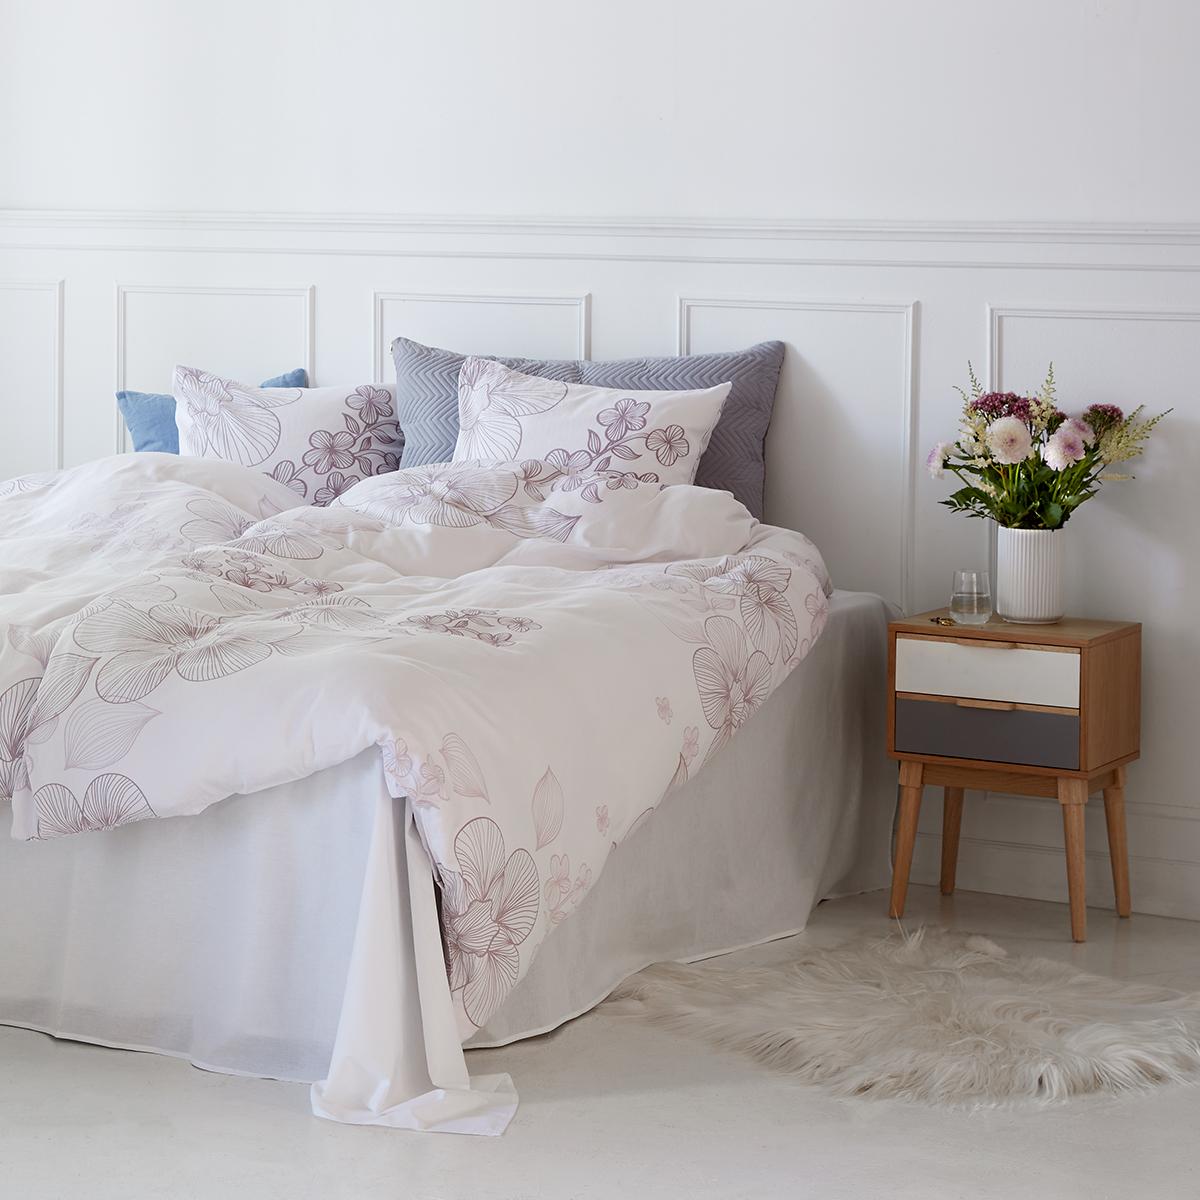 f2f7a4fd00a Isabell Kristensen sengetøj - Hvid Bomuldssatin - 140 x 200 cm - Coop.dk